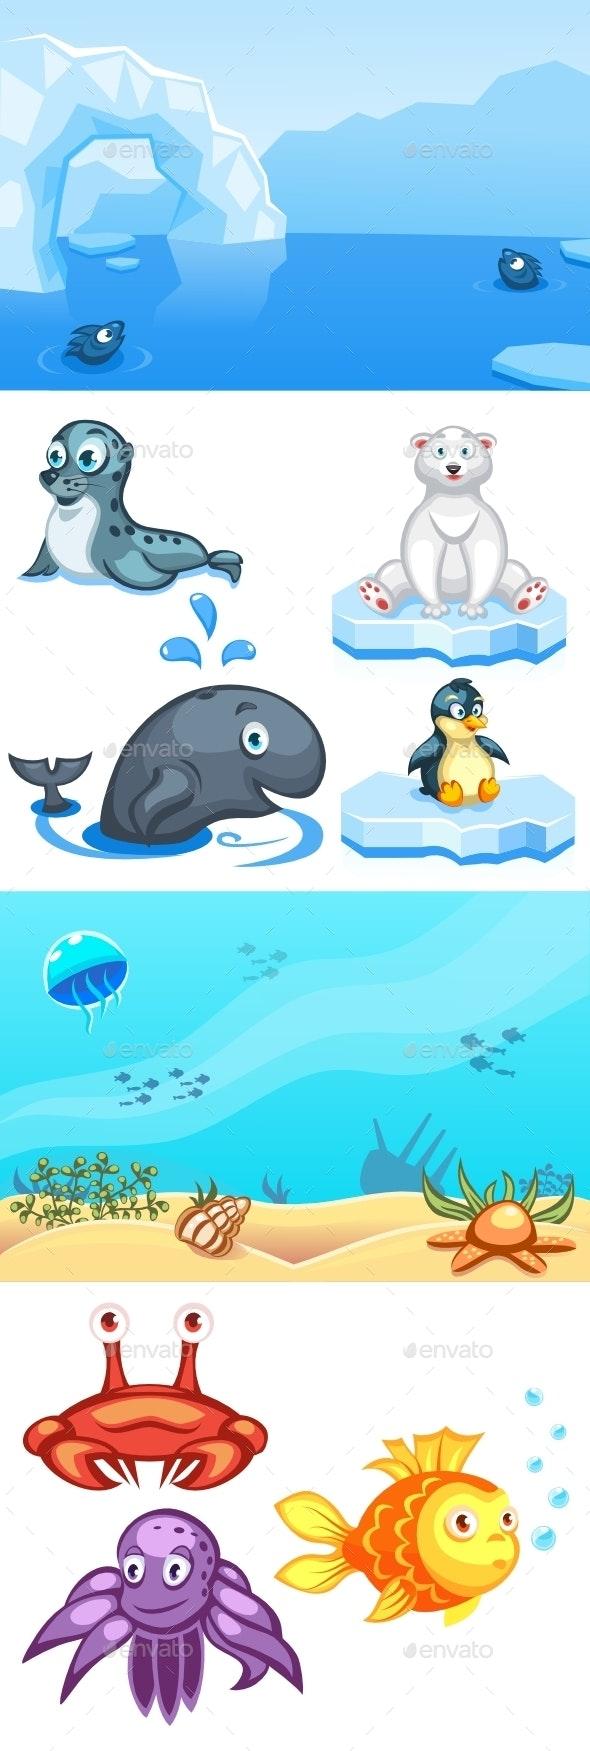 Cartoon Animals Pack-2 - Animals Characters